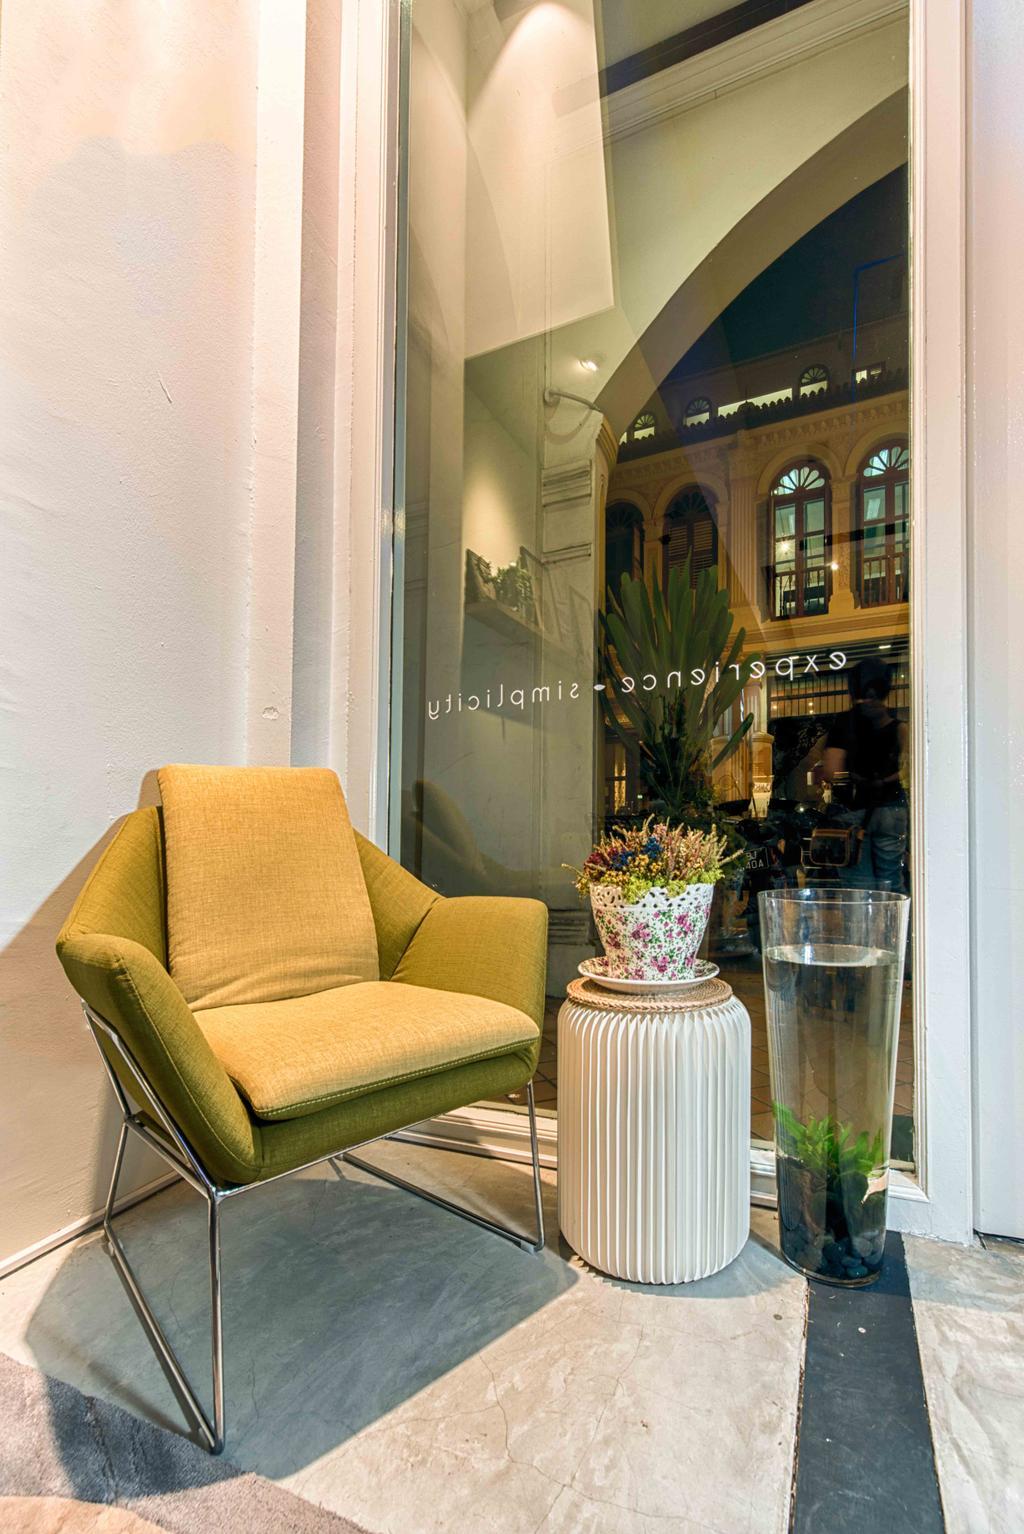 Salon, Commercial, Interior Designer, Mr Shopper Studio, Eclectic, Scandinavian, Retro, Couch, Furniture, Flora, Jar, Plant, Potted Plant, Pottery, Vase, Chair